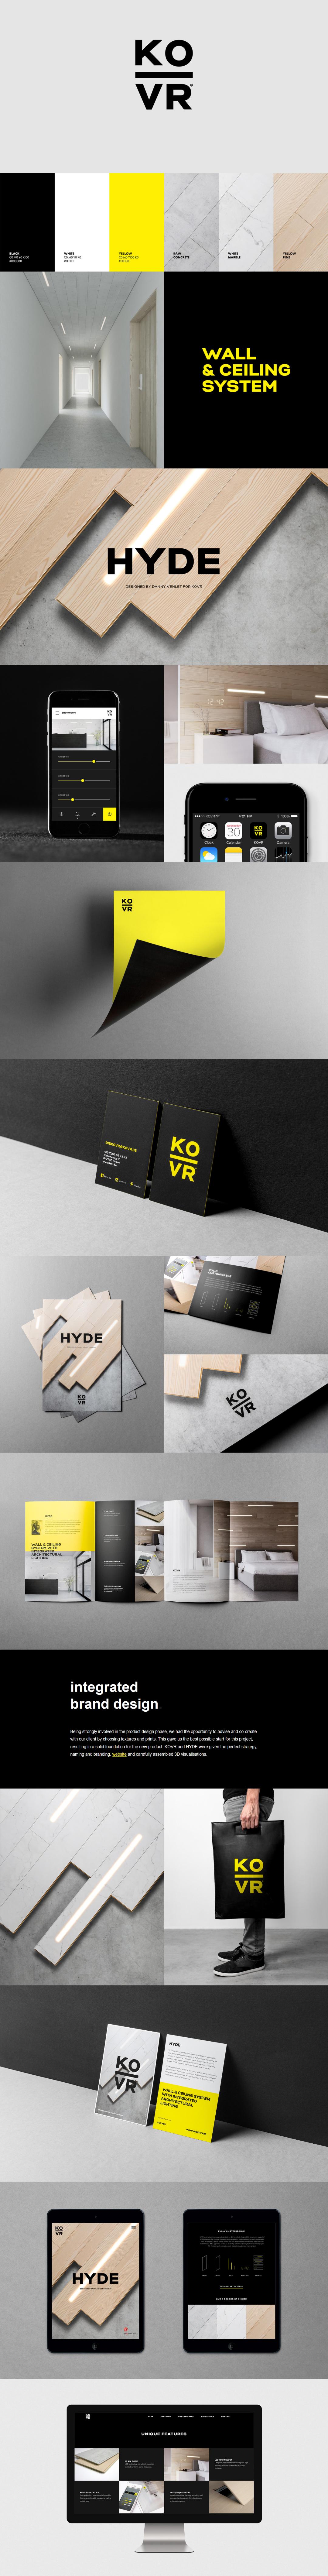 Best Brand Identity Design